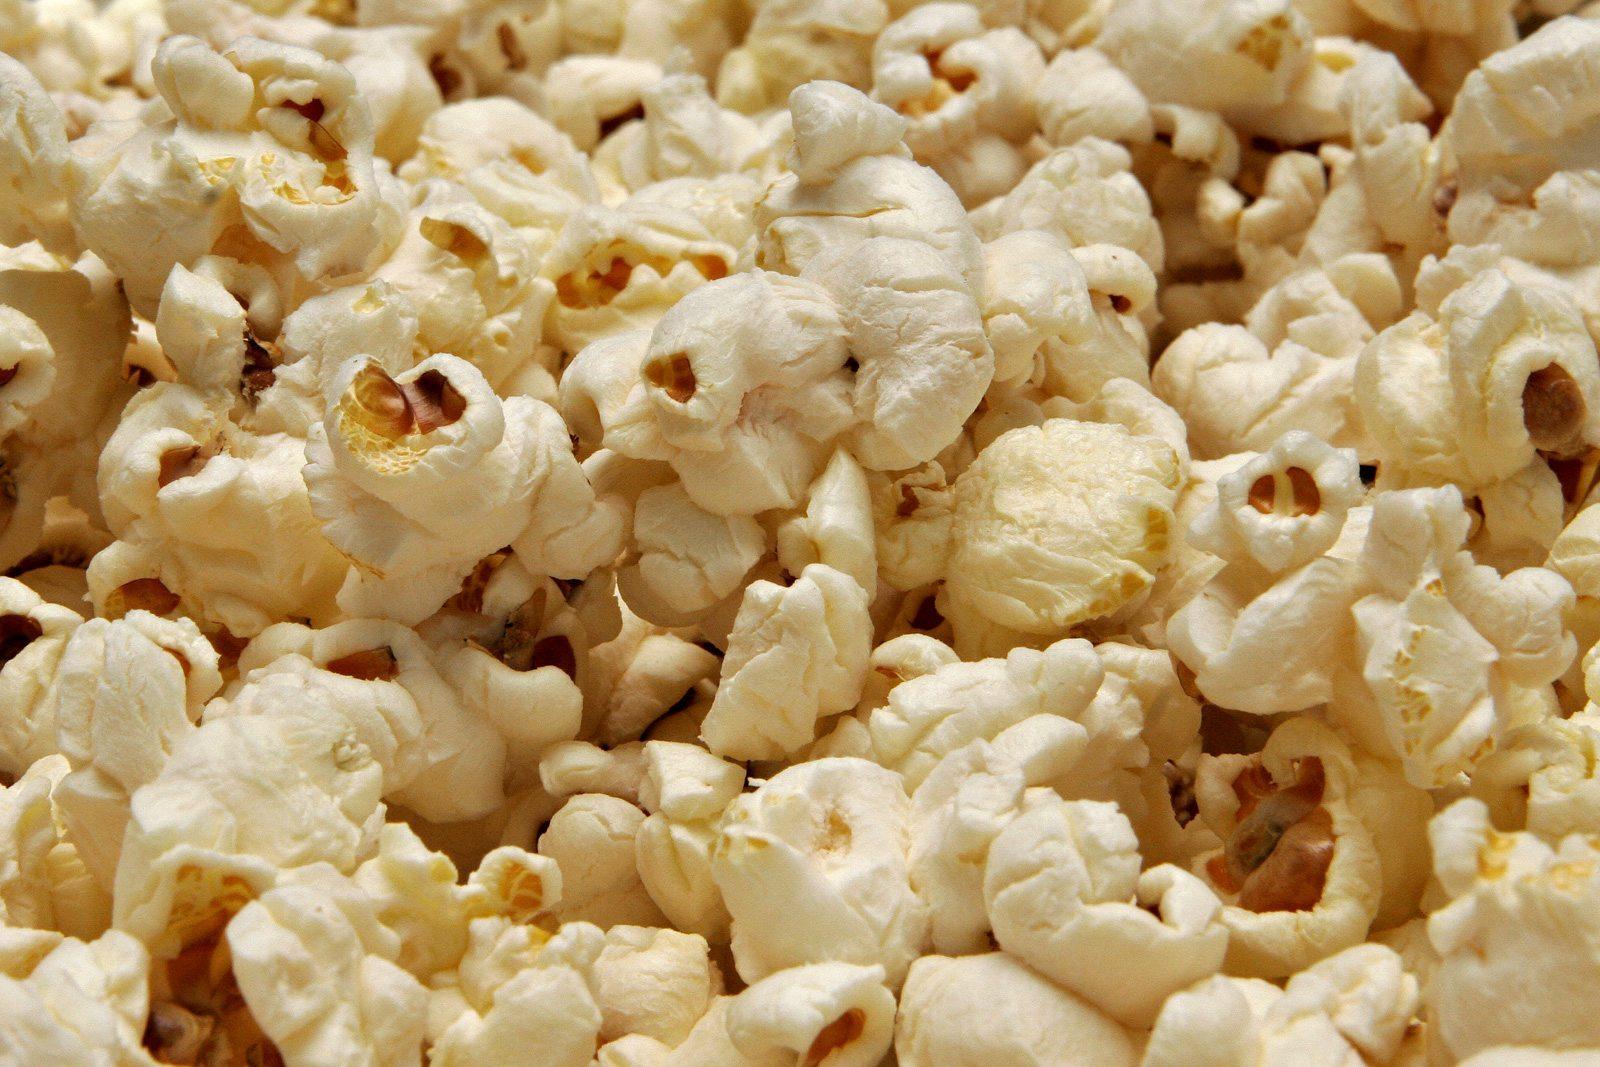 Popcorn021